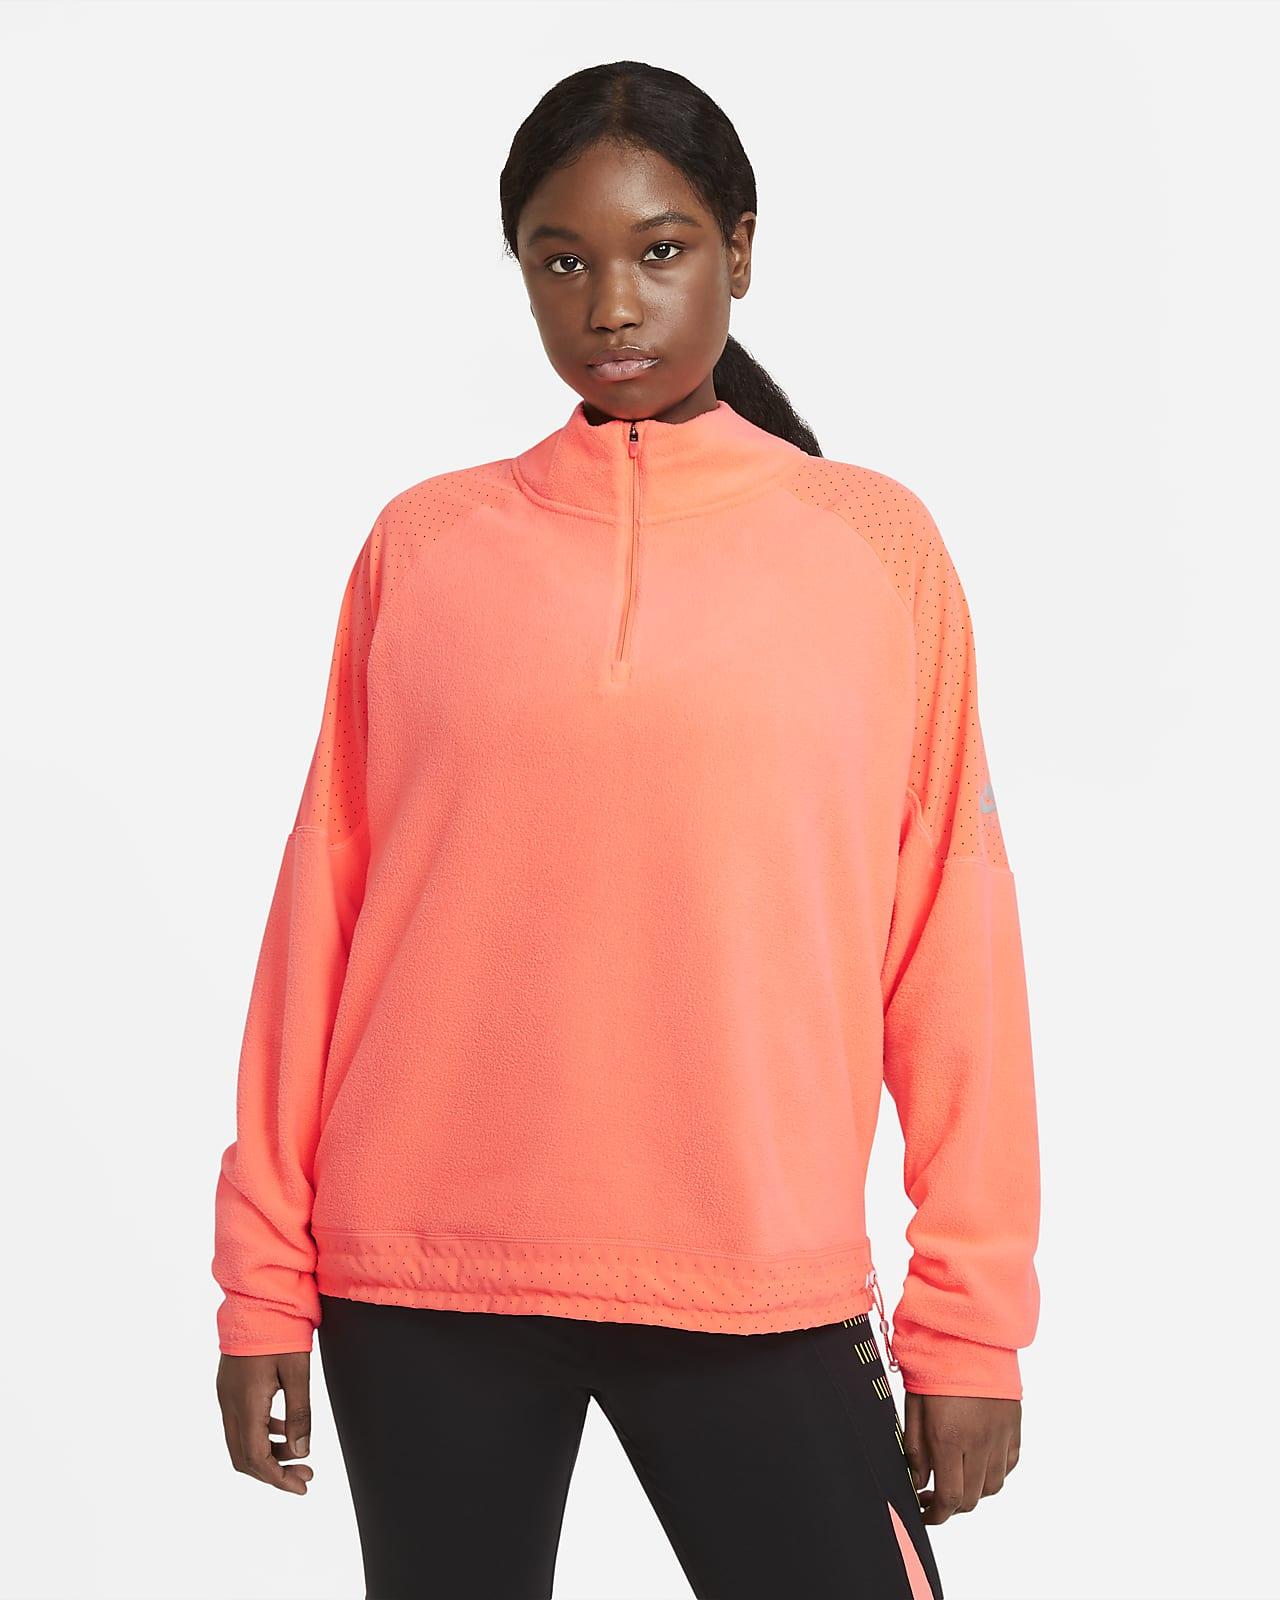 Camiseta de running para mujer (talla grande) Nike Air Midlayer